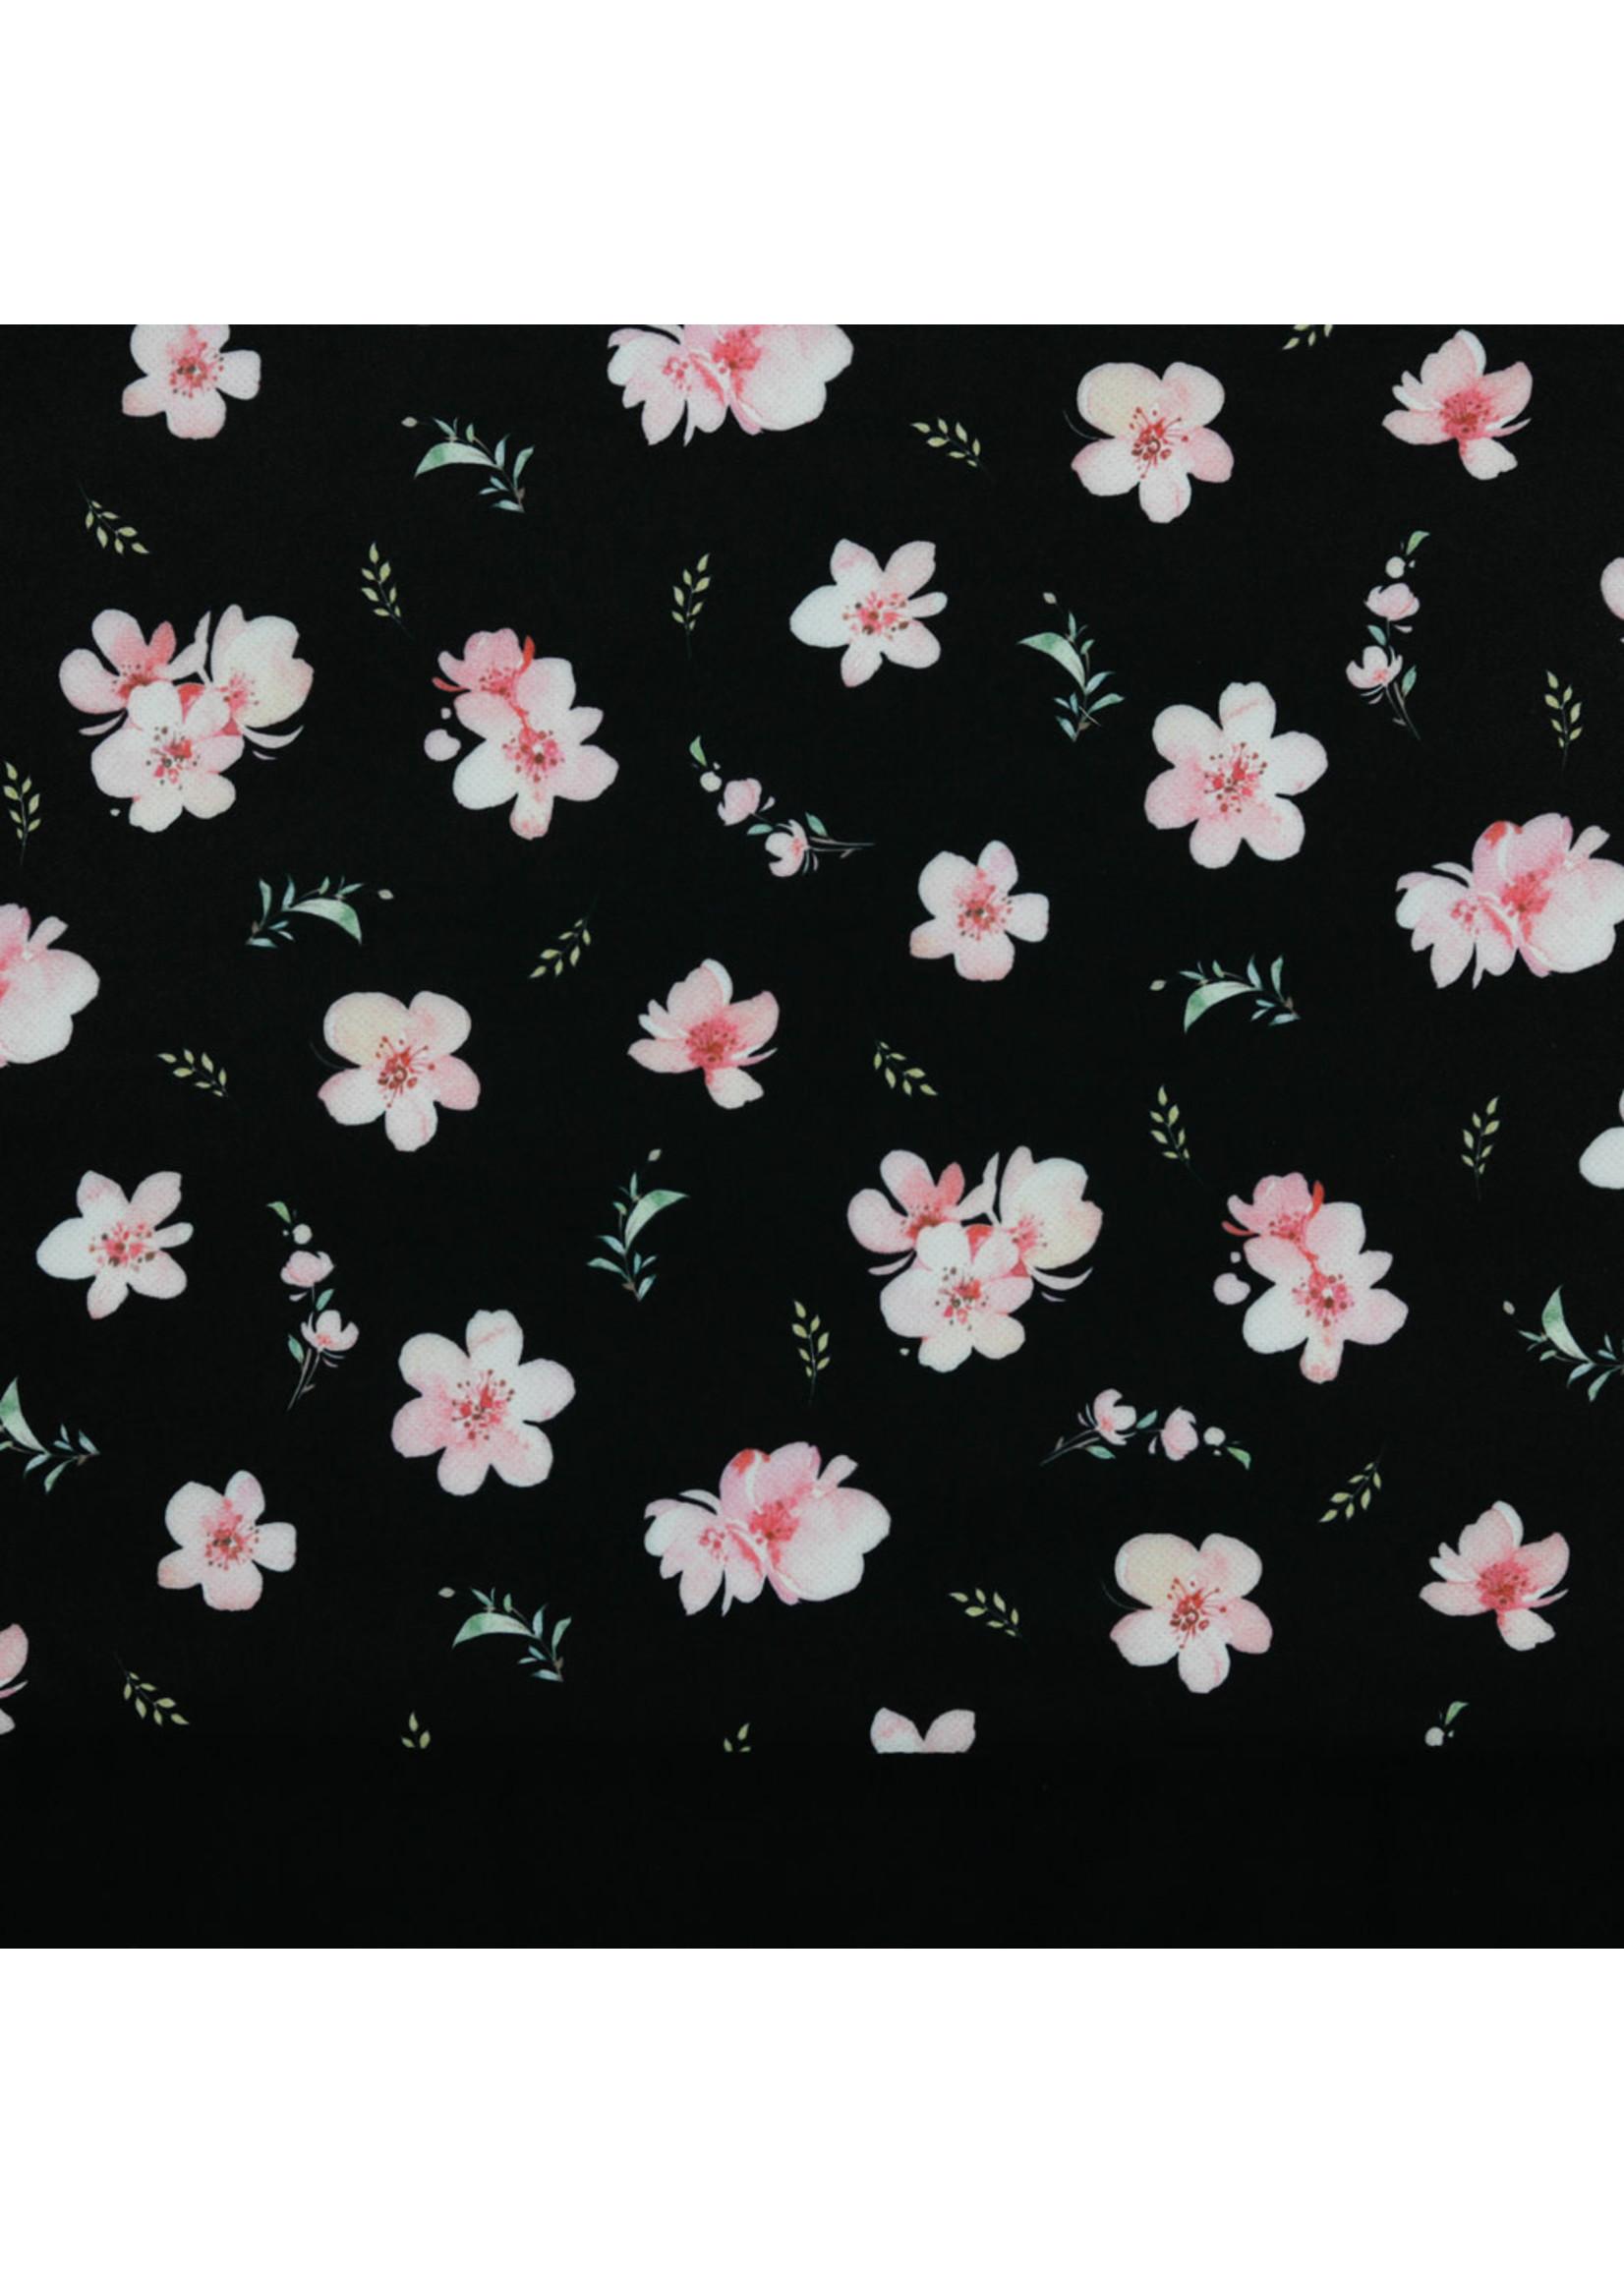 Designed for you by Poppy Softshell Digital Cherry Flowers